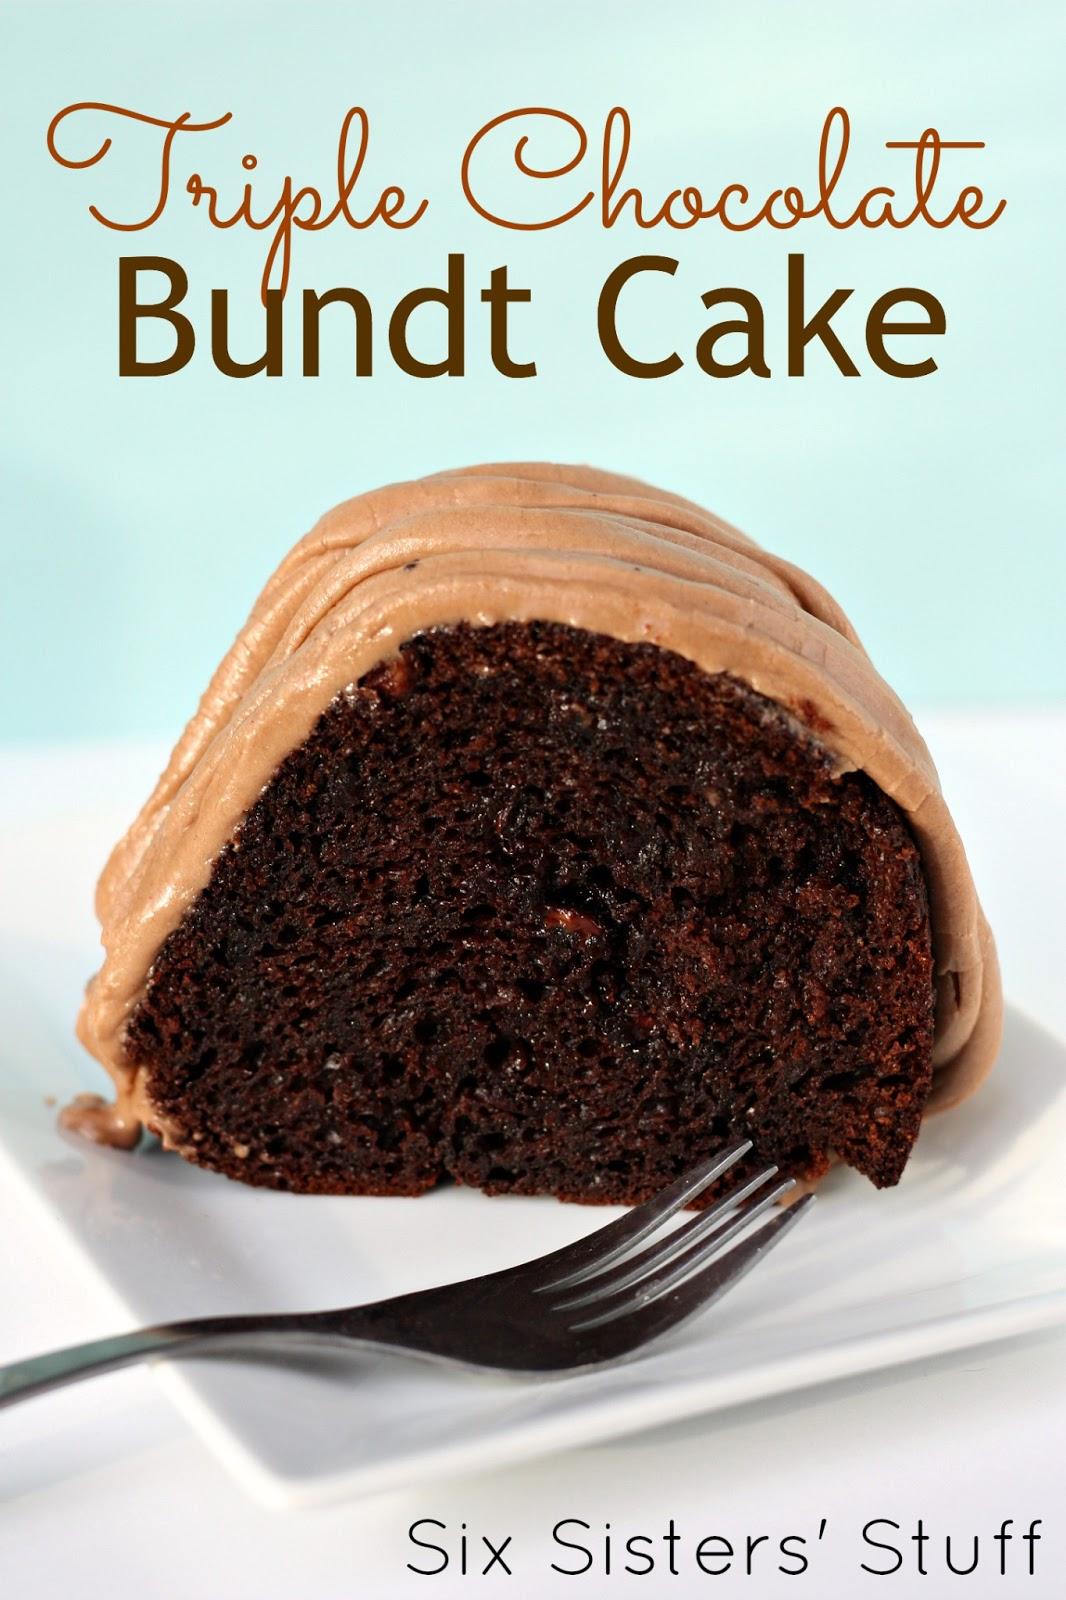 Triple Chocolate Bundt Cake | Six Sisters' Stuff